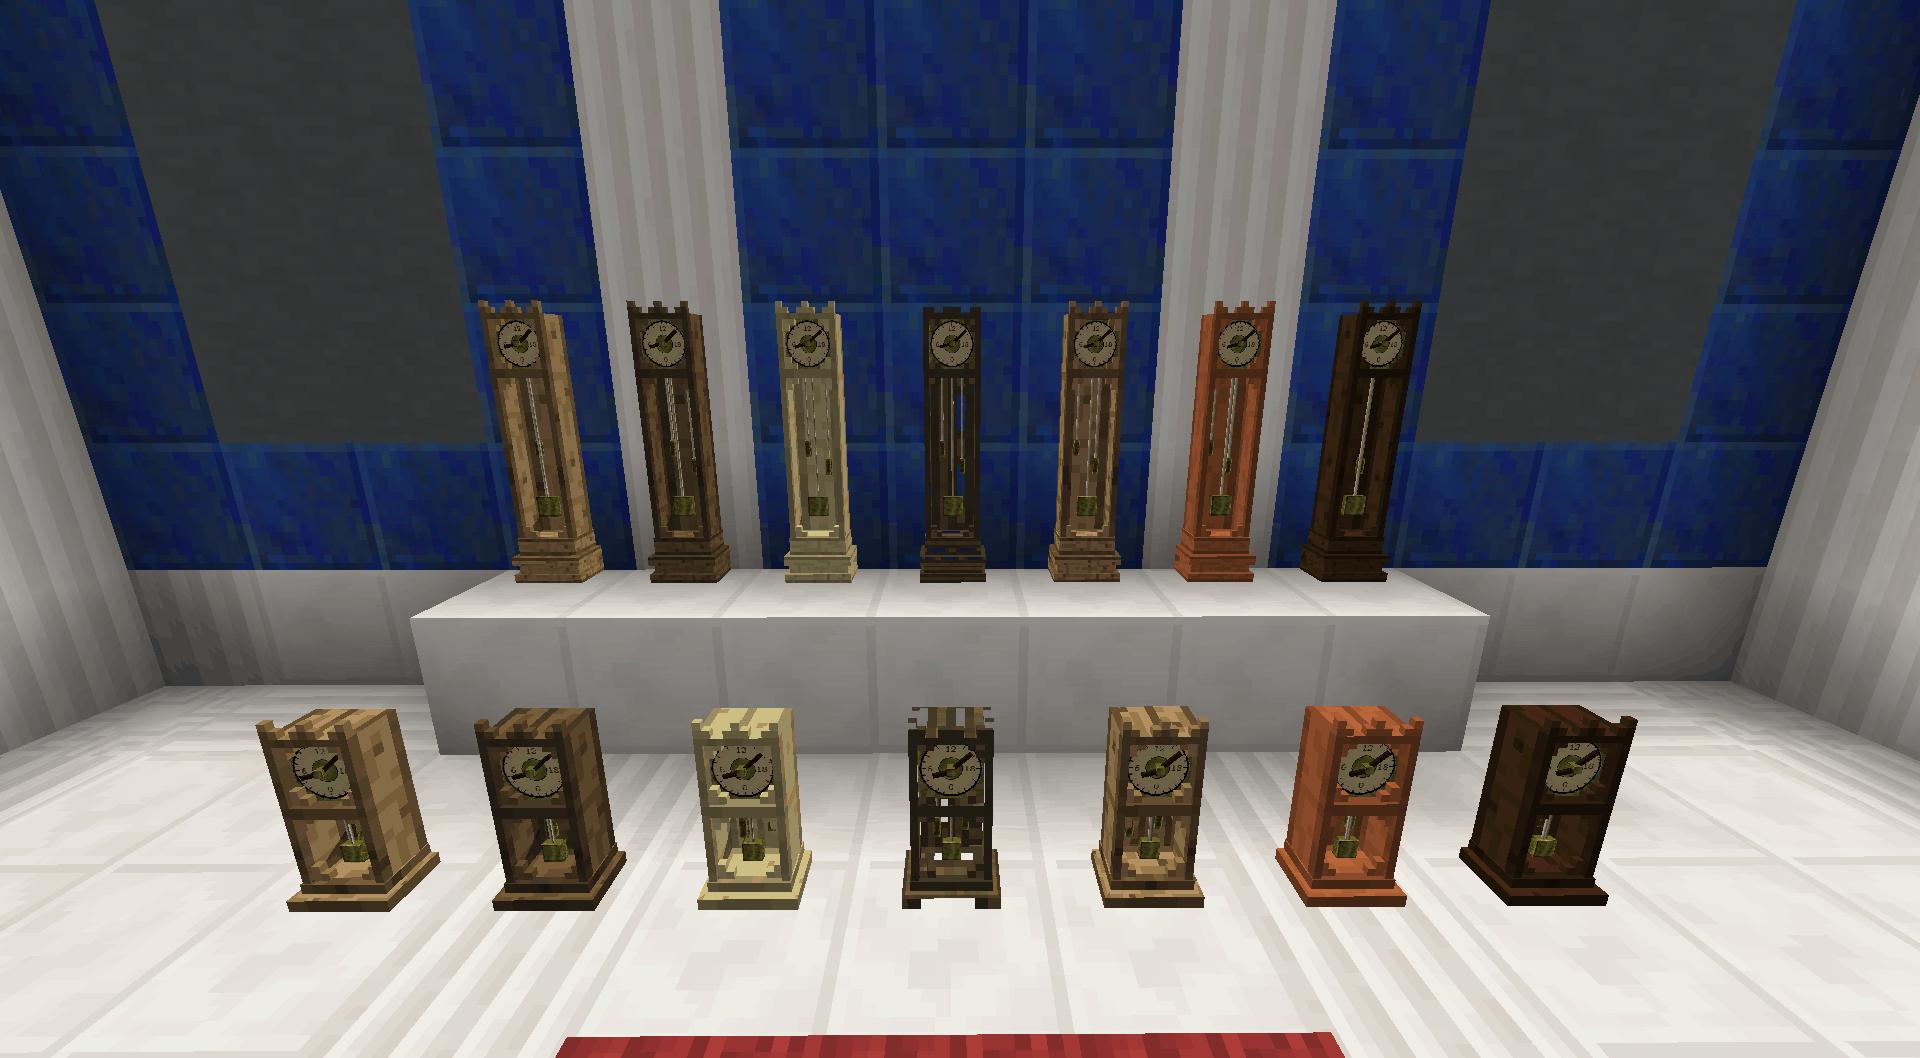 Bibliocraft - Clock